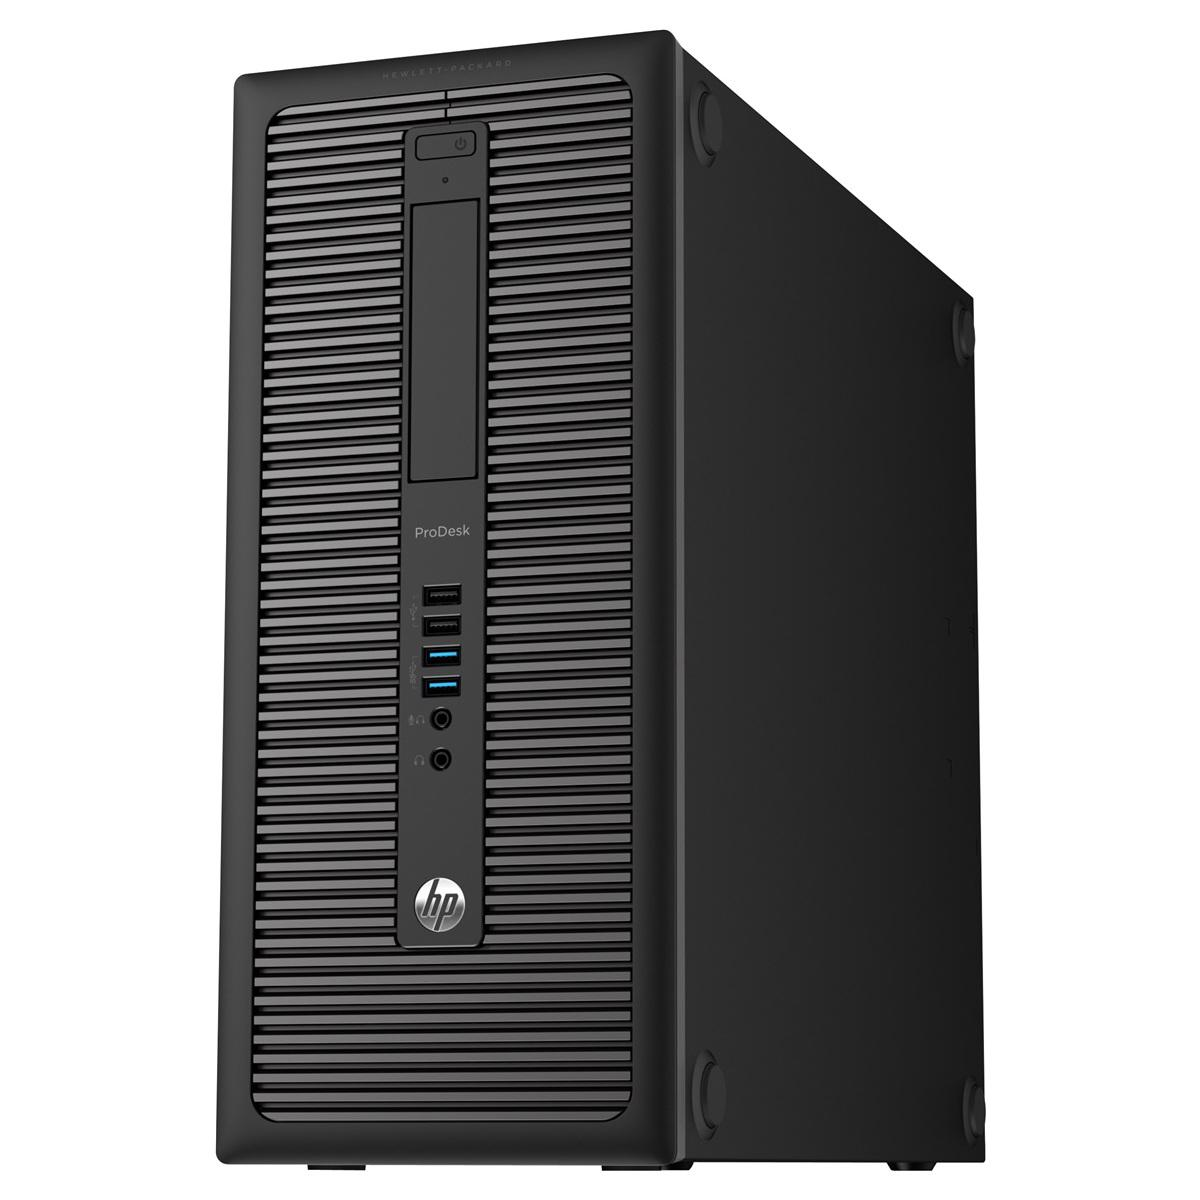 HP ProDesk 600 G1 Pentium 3 GHz - HDD 500 GB RAM 8 GB